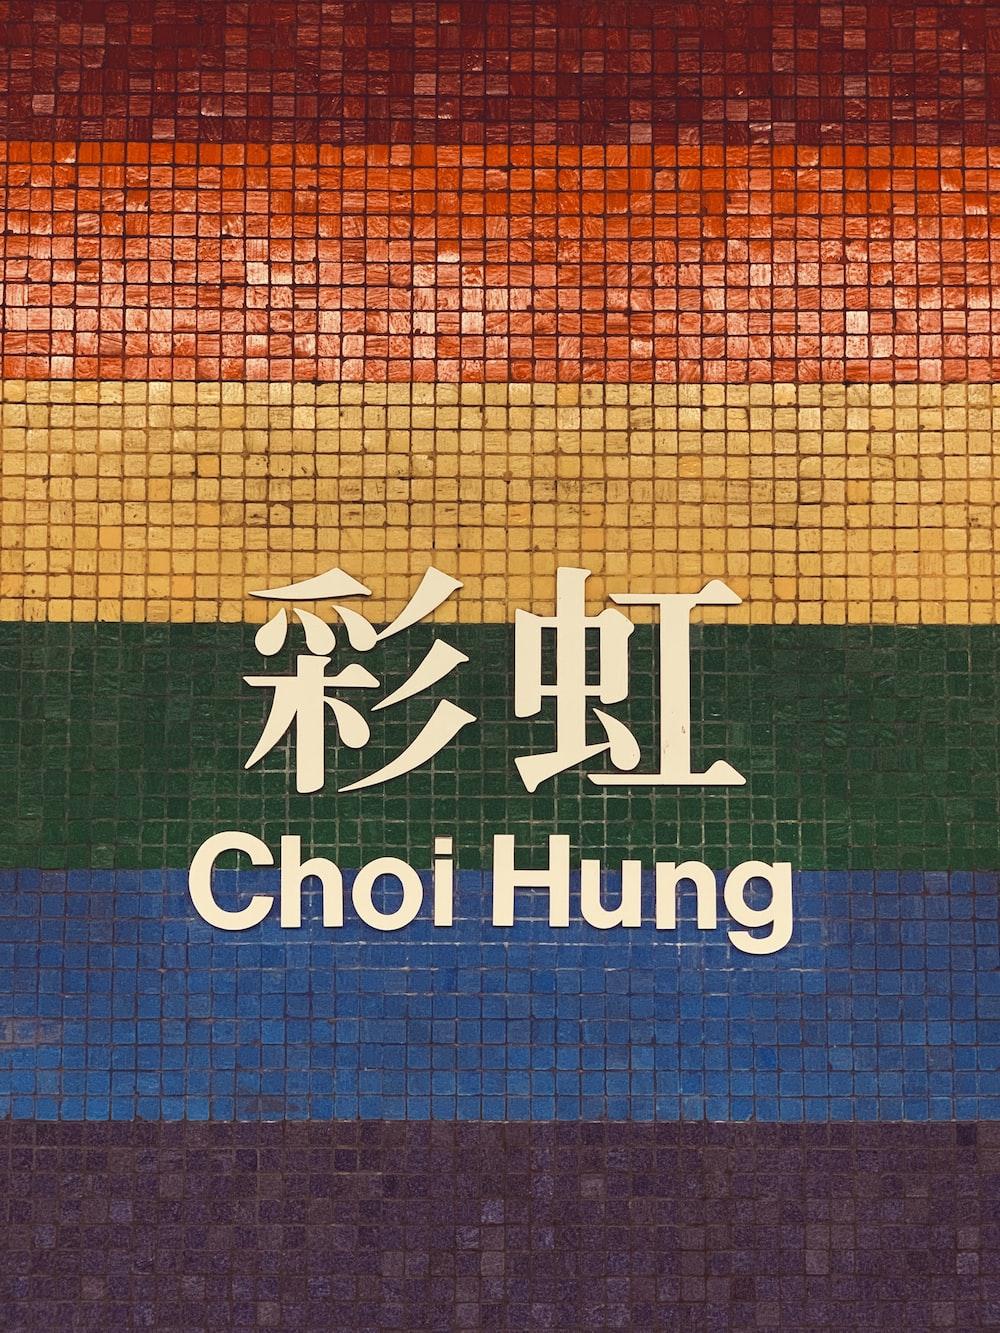 Choi Hung wall decor